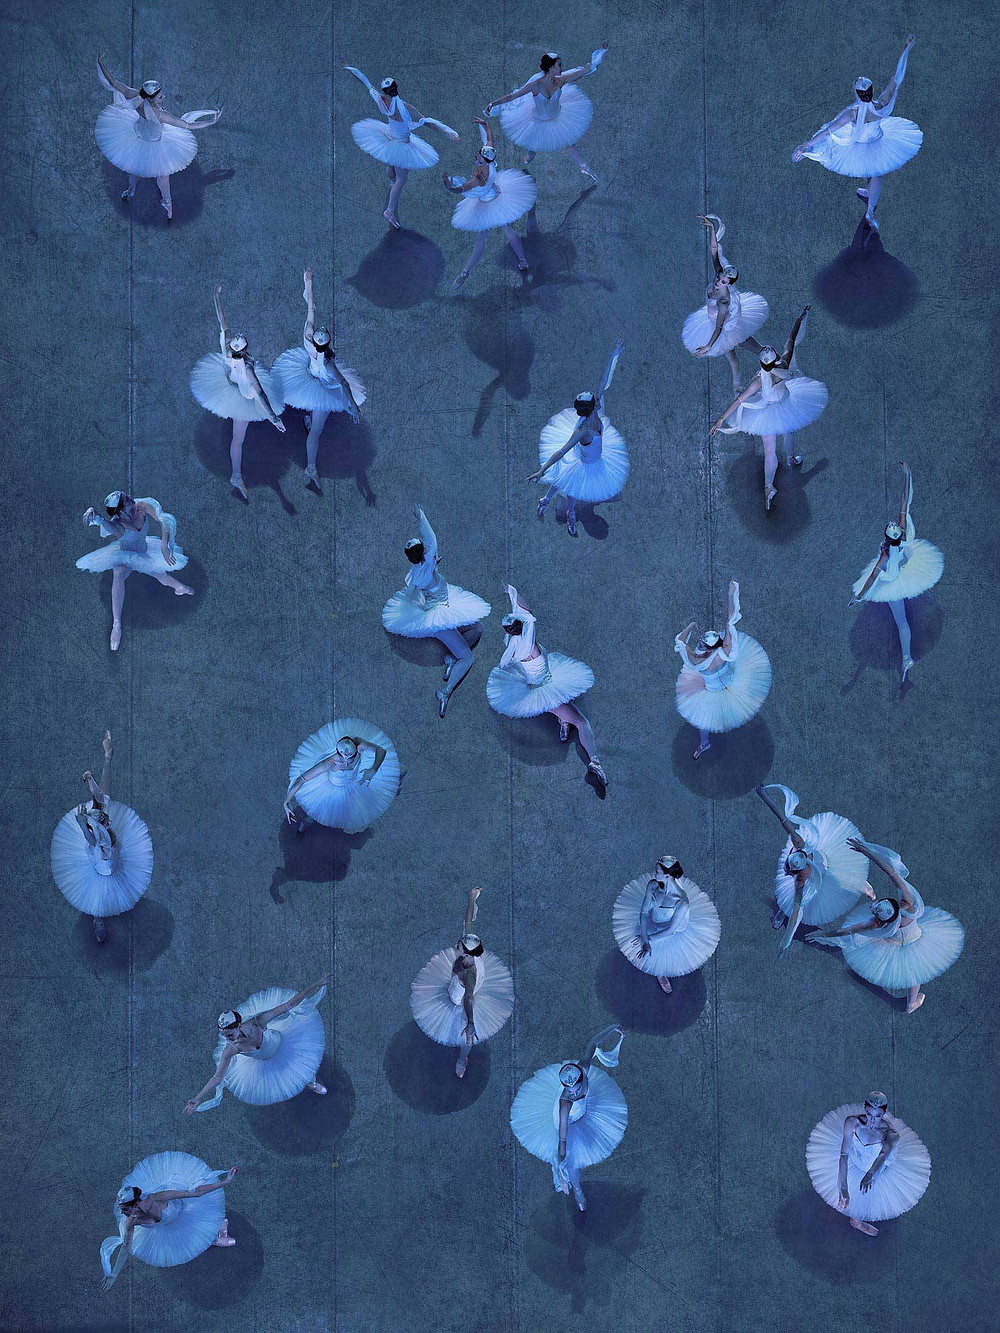 ingrid-bugge-ballet-photography-yellowtrace-01